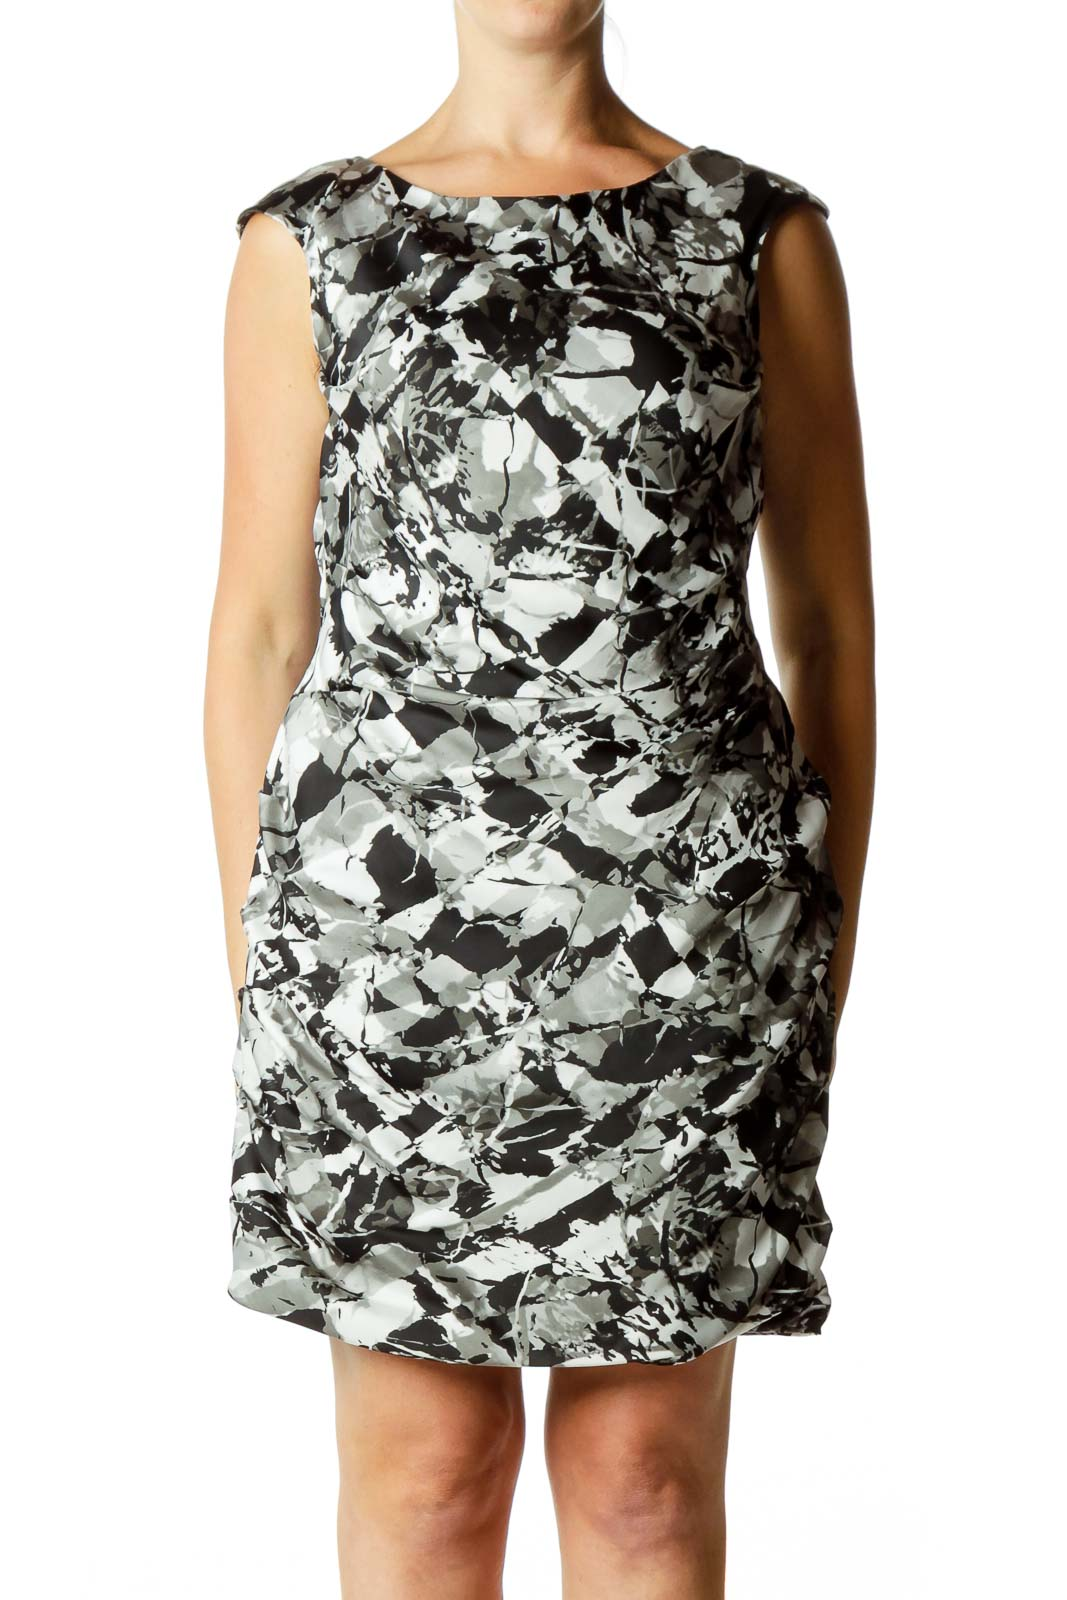 Black & Gray Sleeveless Dress